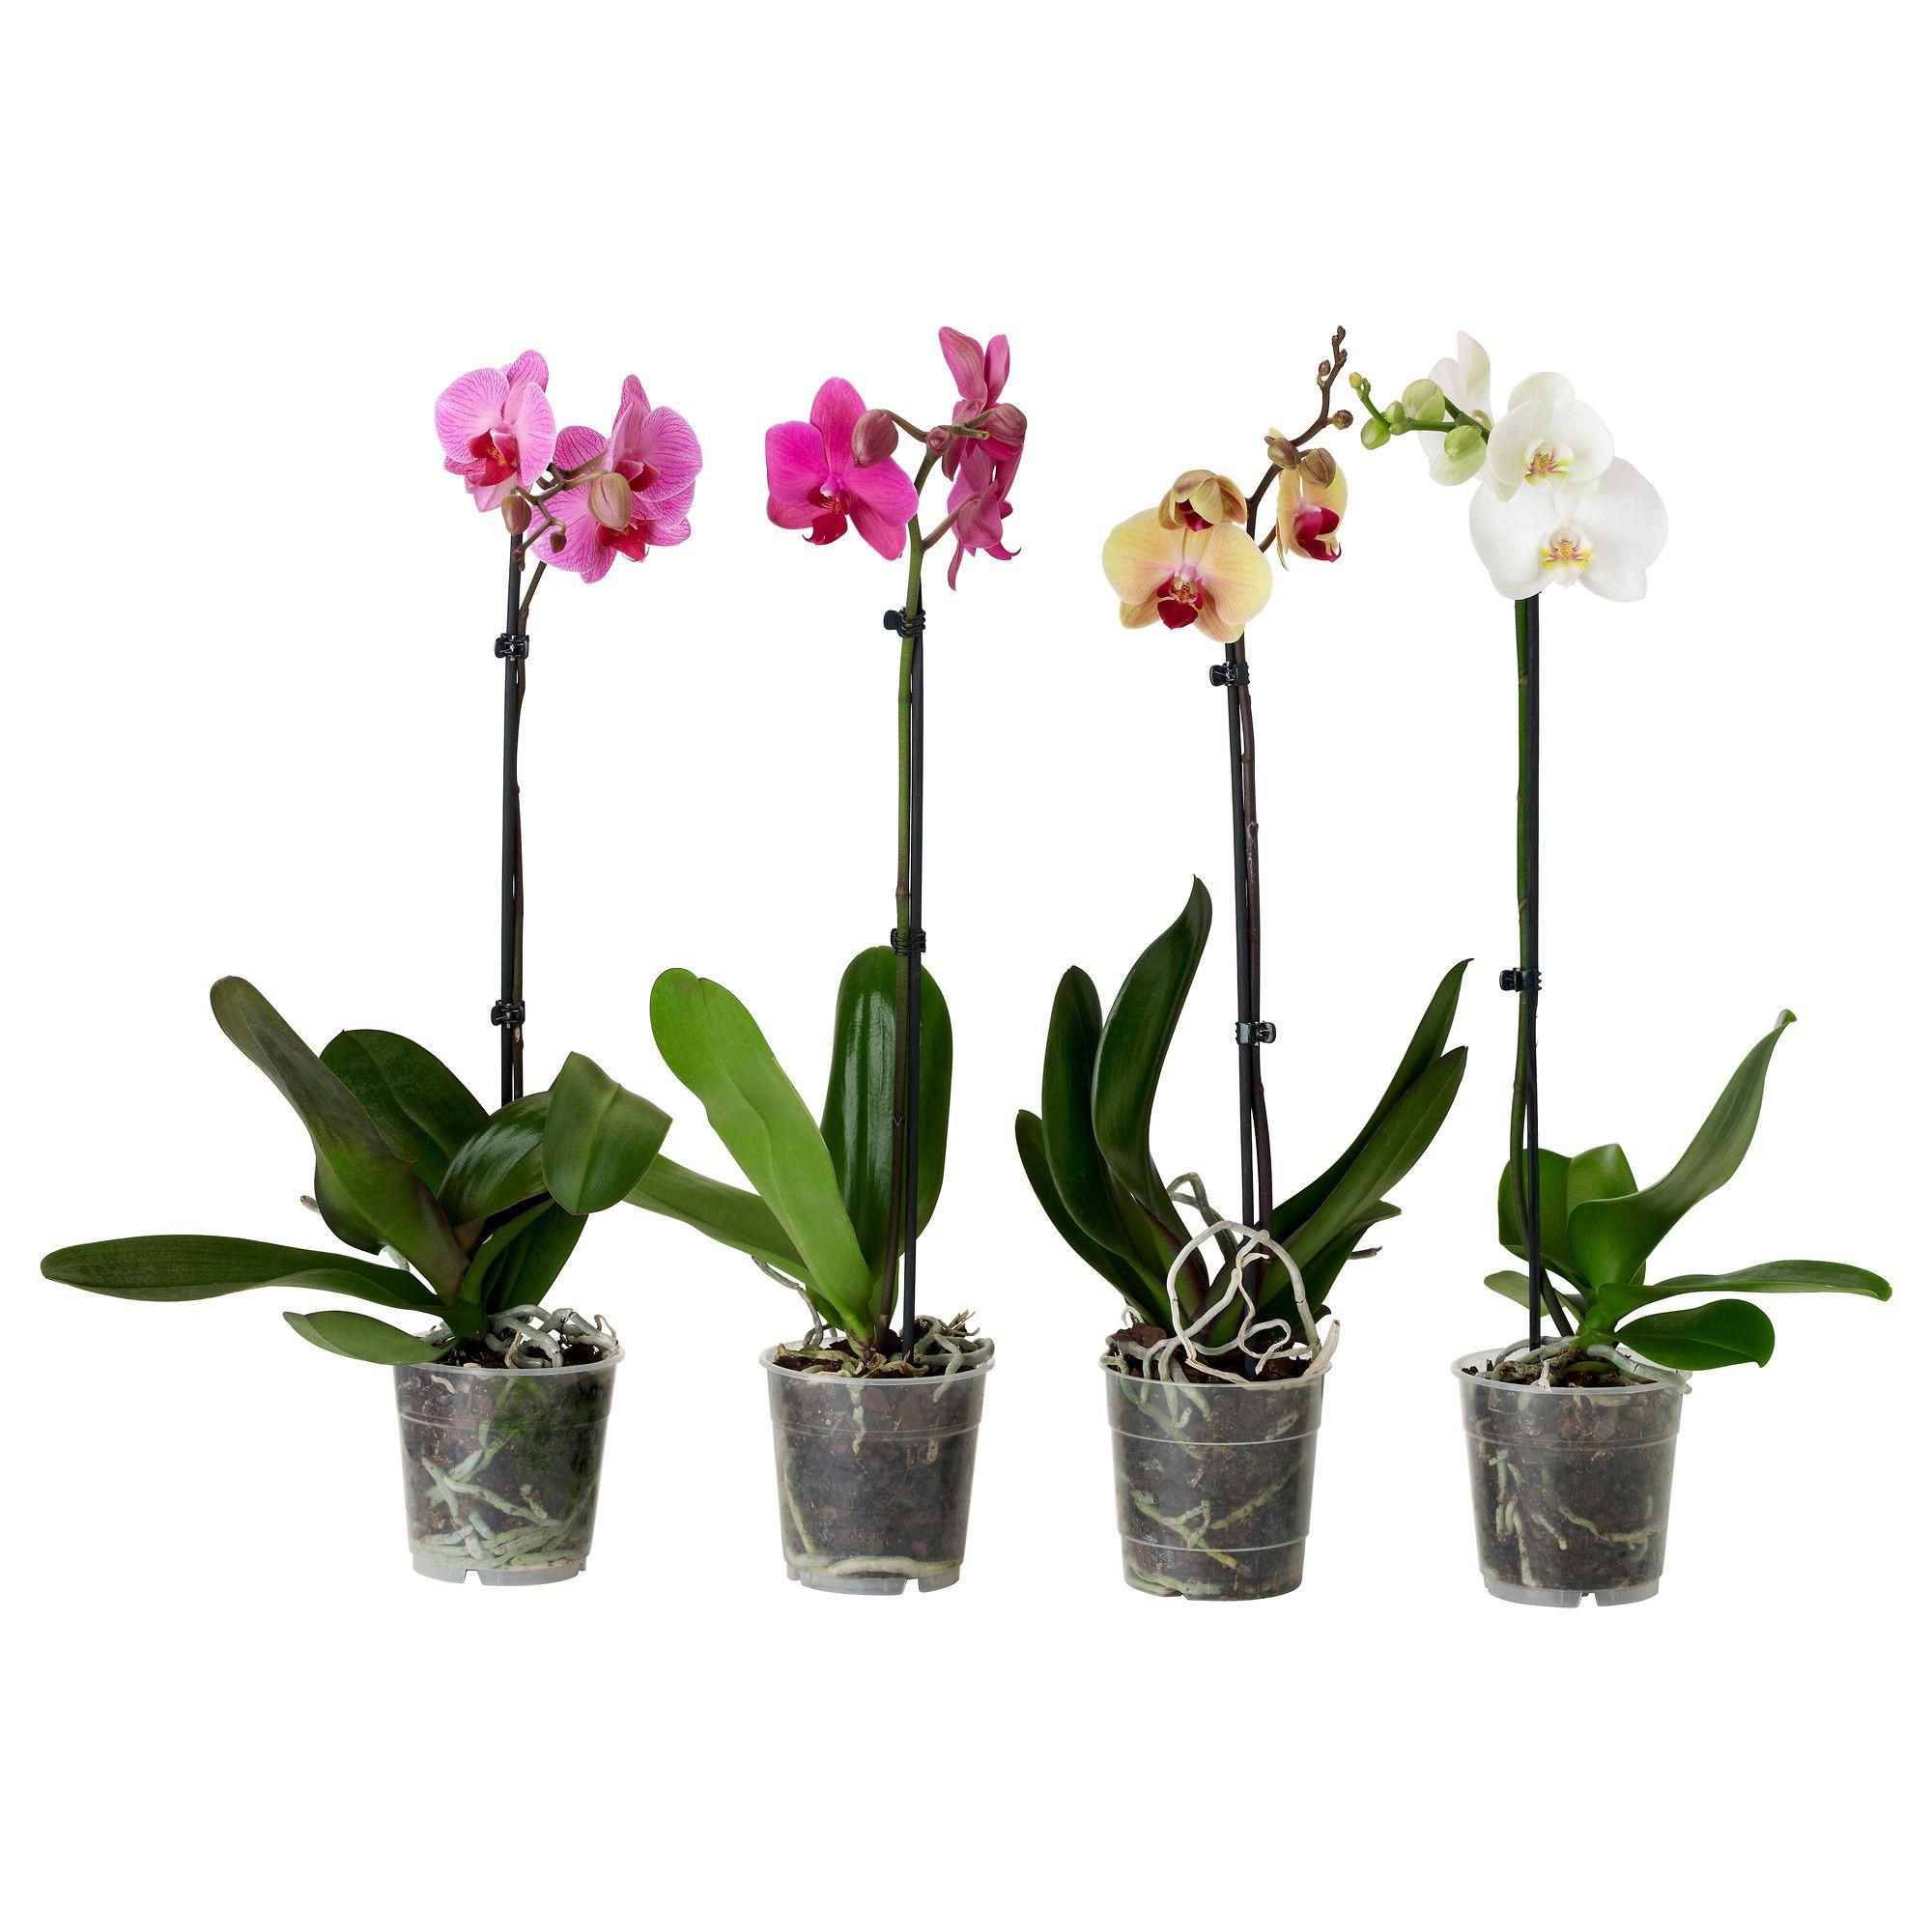 Phalaenopsis potted plant ikea home office pinterest for Ikea plantes